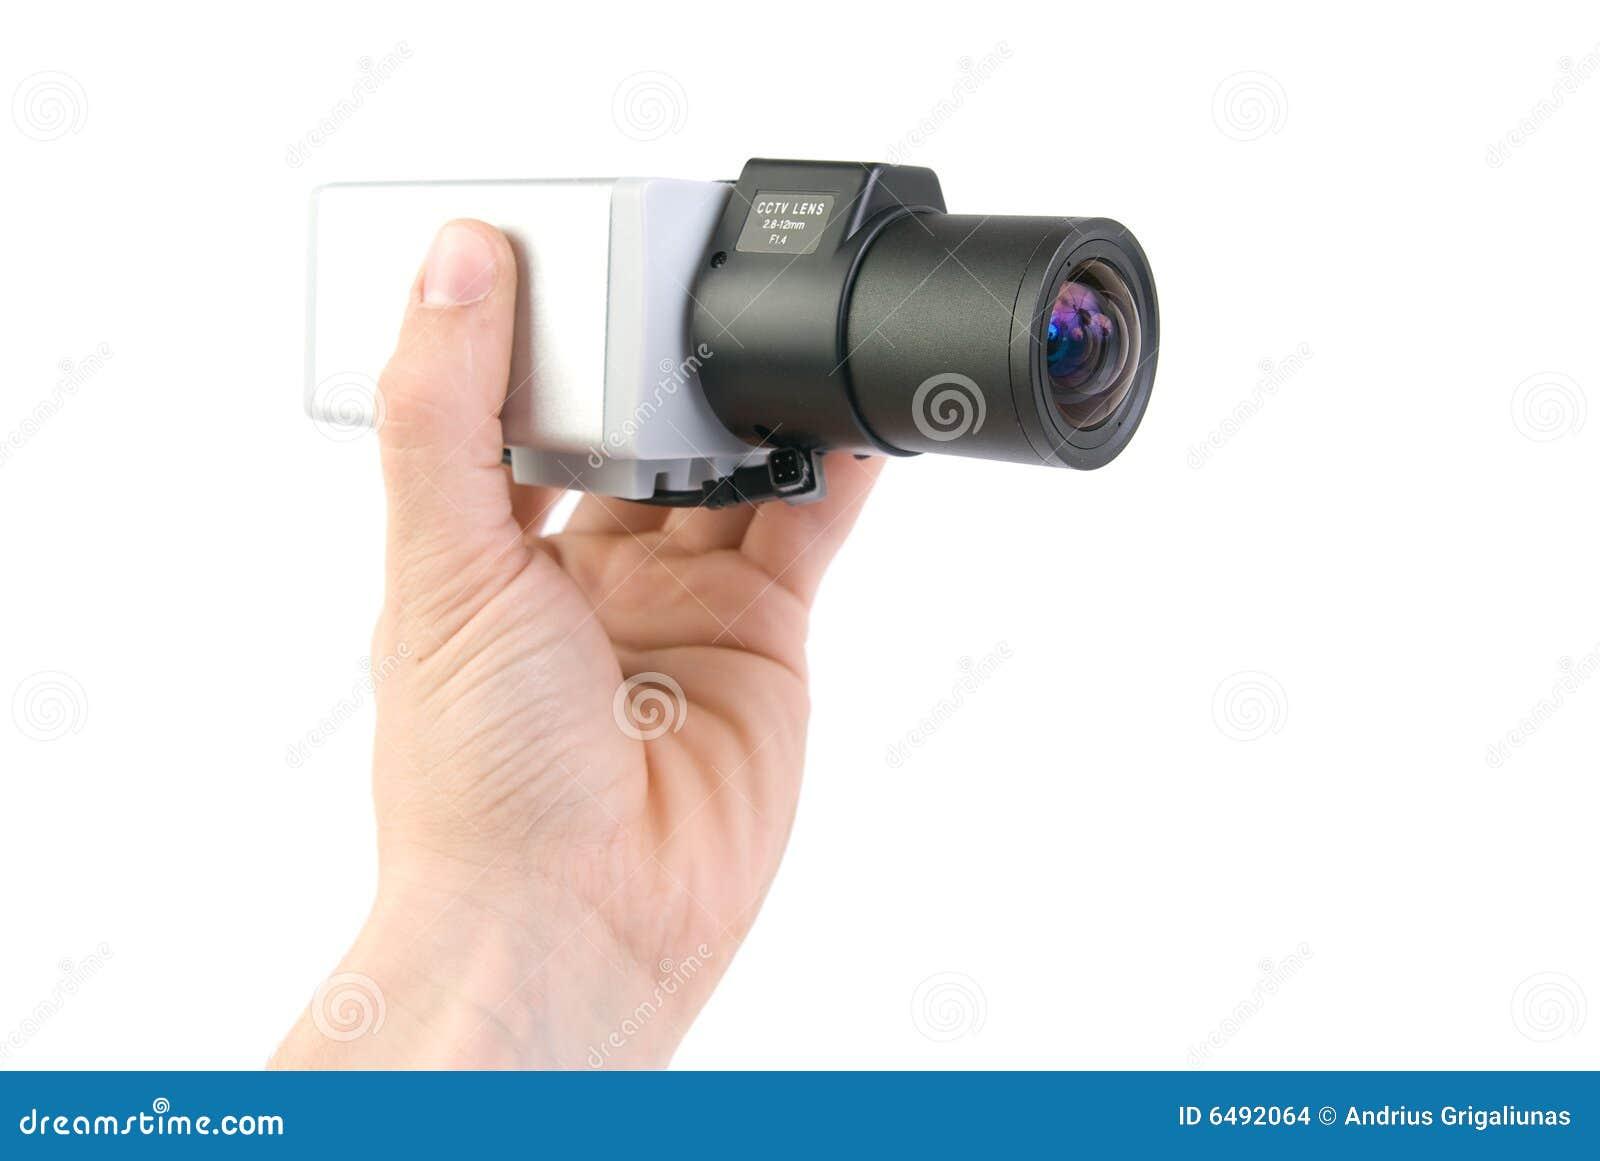 Cctv camera in hand